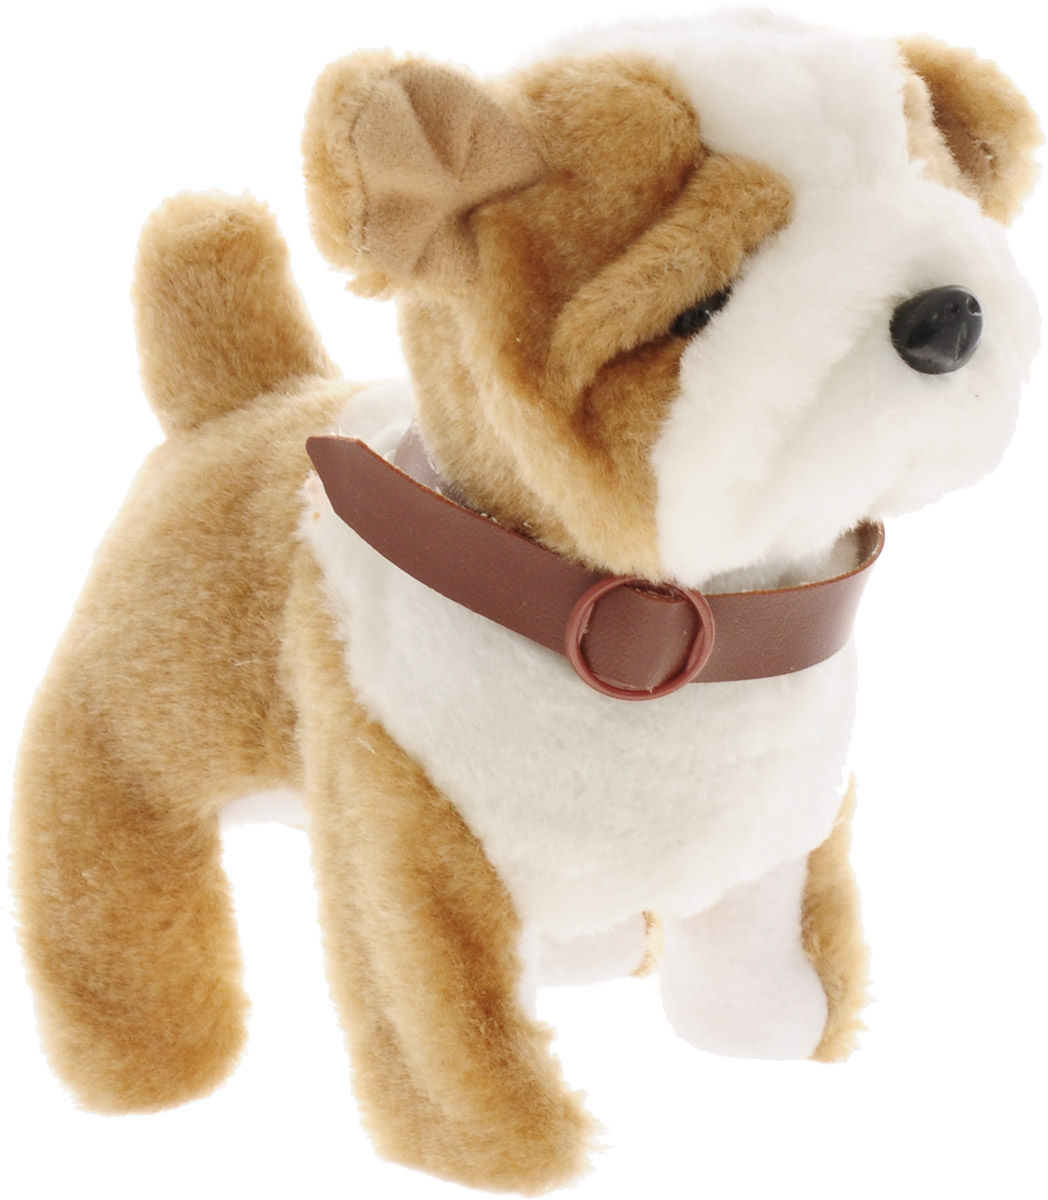 Sonata Style Анимированная мягкая игрушка Собачка цвет белый бежевый sonata style собачка gt9041 на р у ходит лает виляет хвостом на батарейках tm sonata style